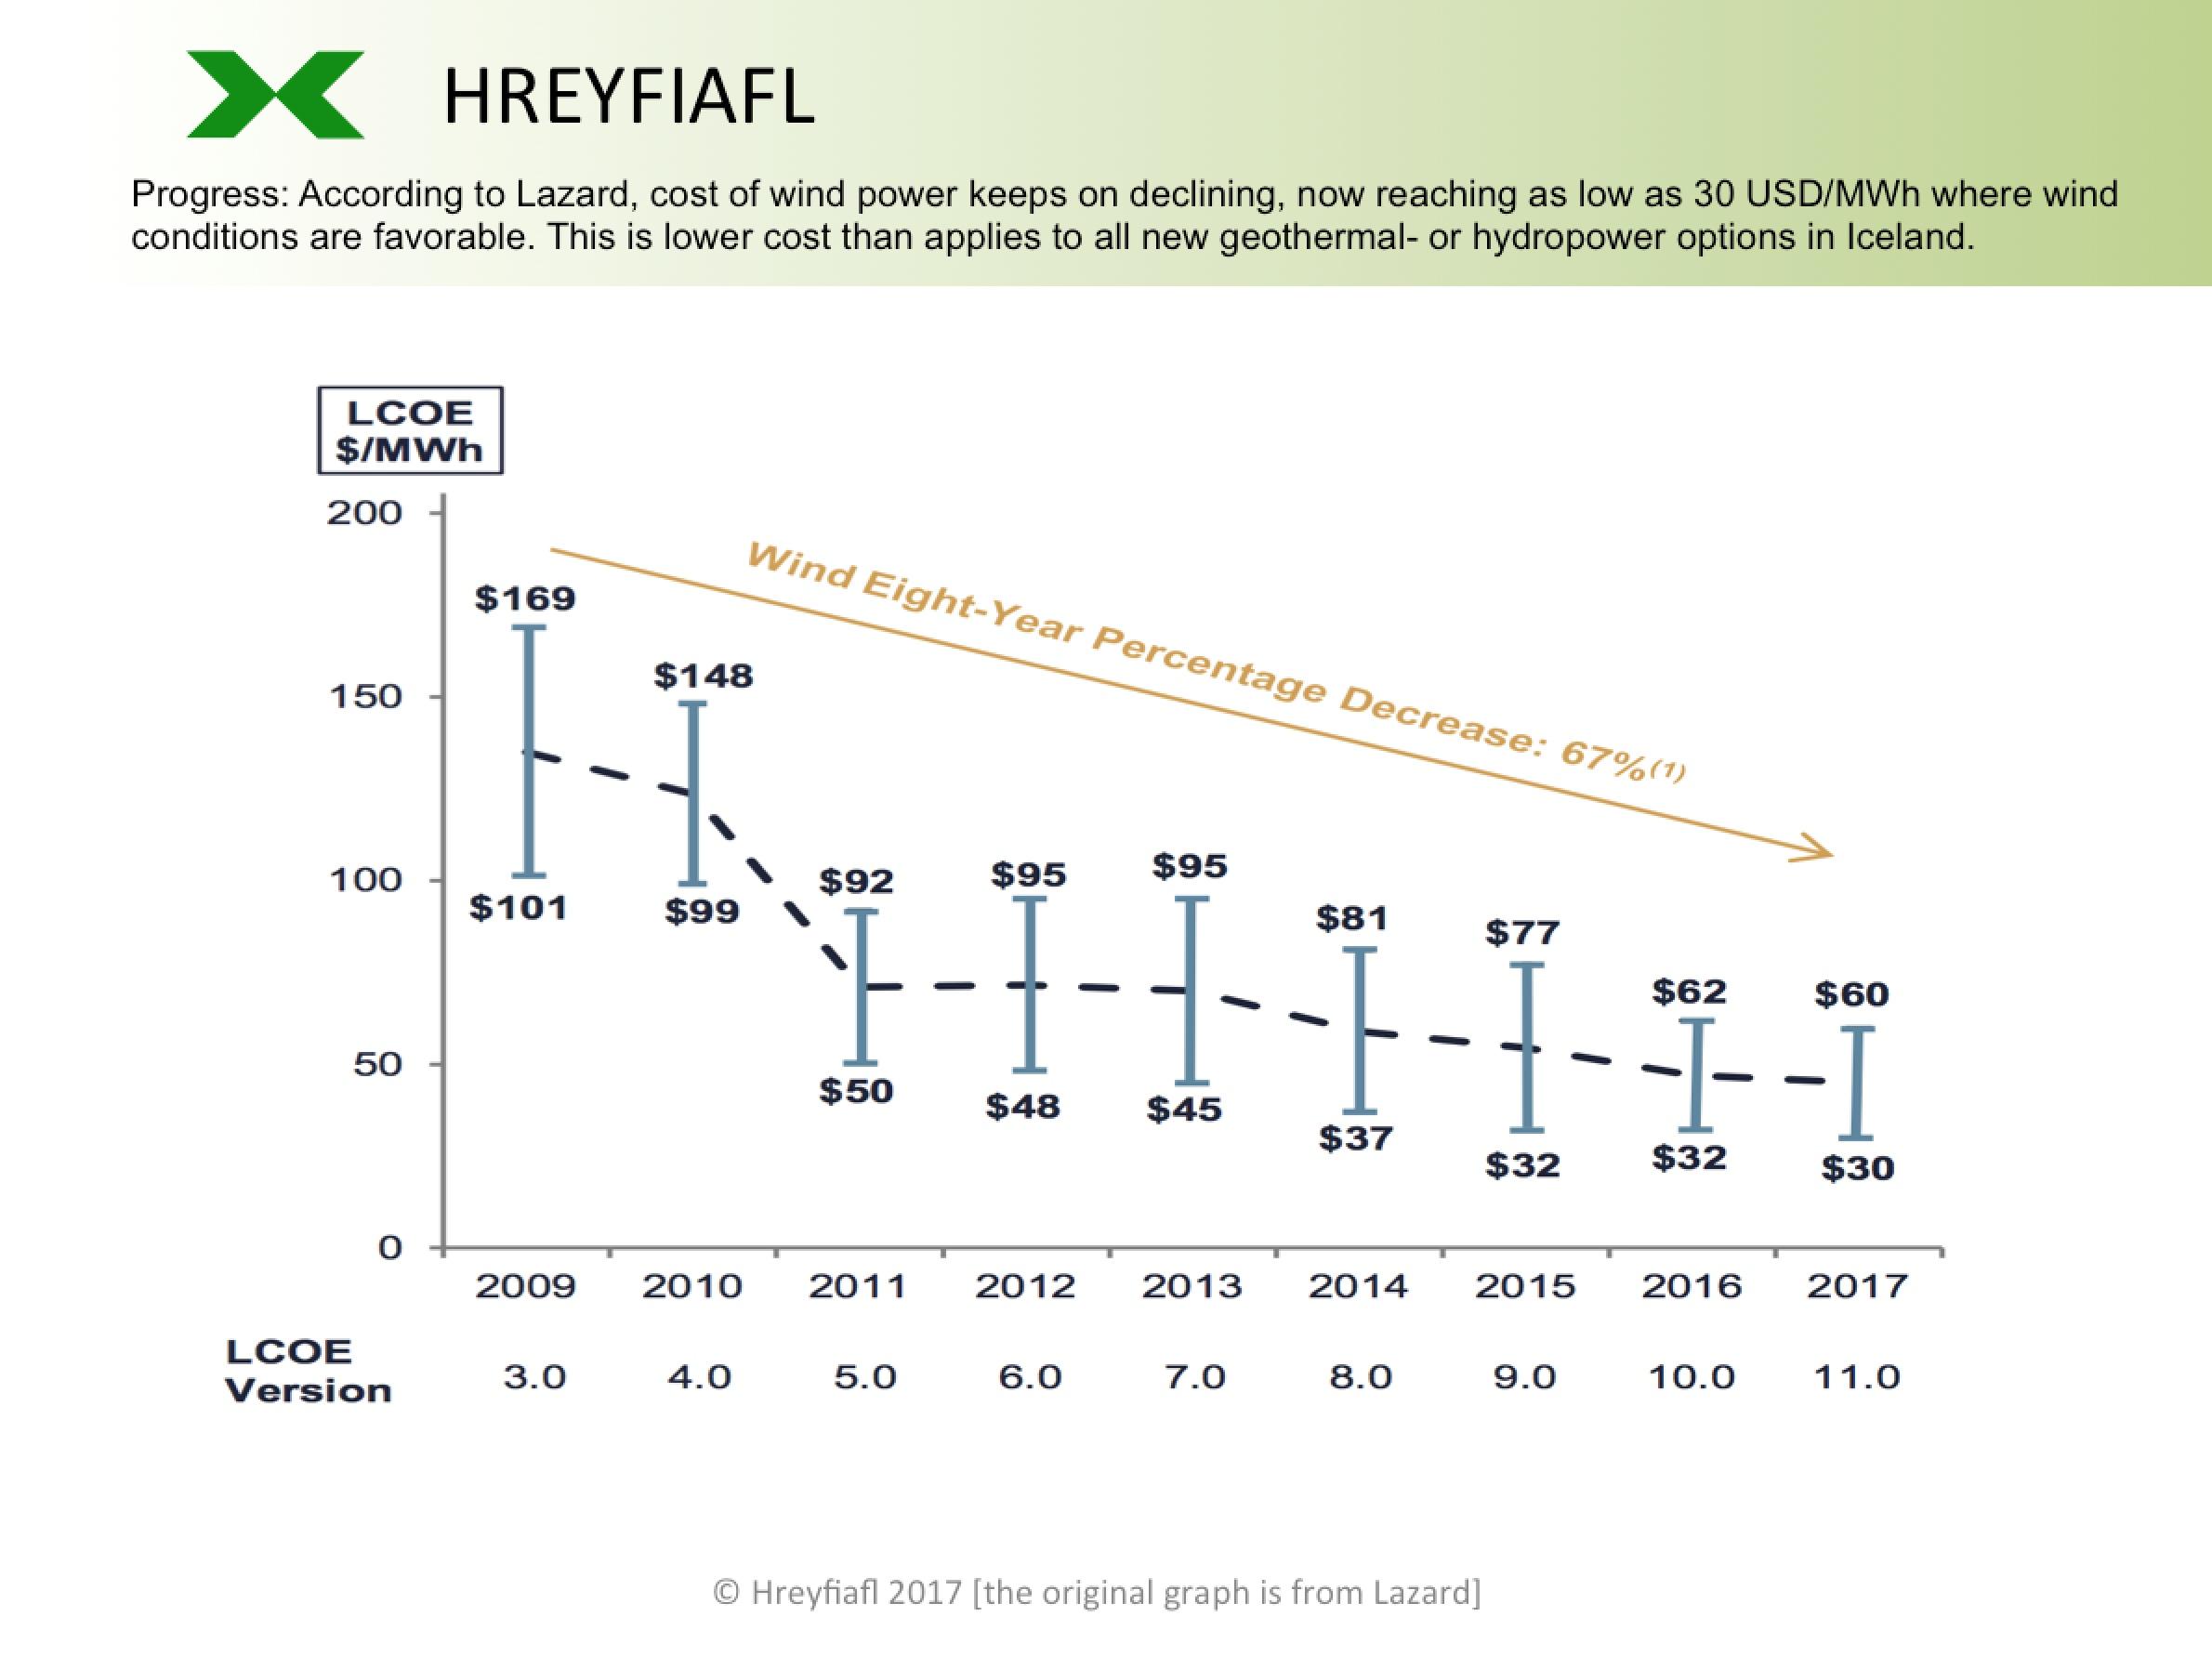 Hreyfiafl-wind-power-cost-development_2009-2017_Lazard-LCOE-version-